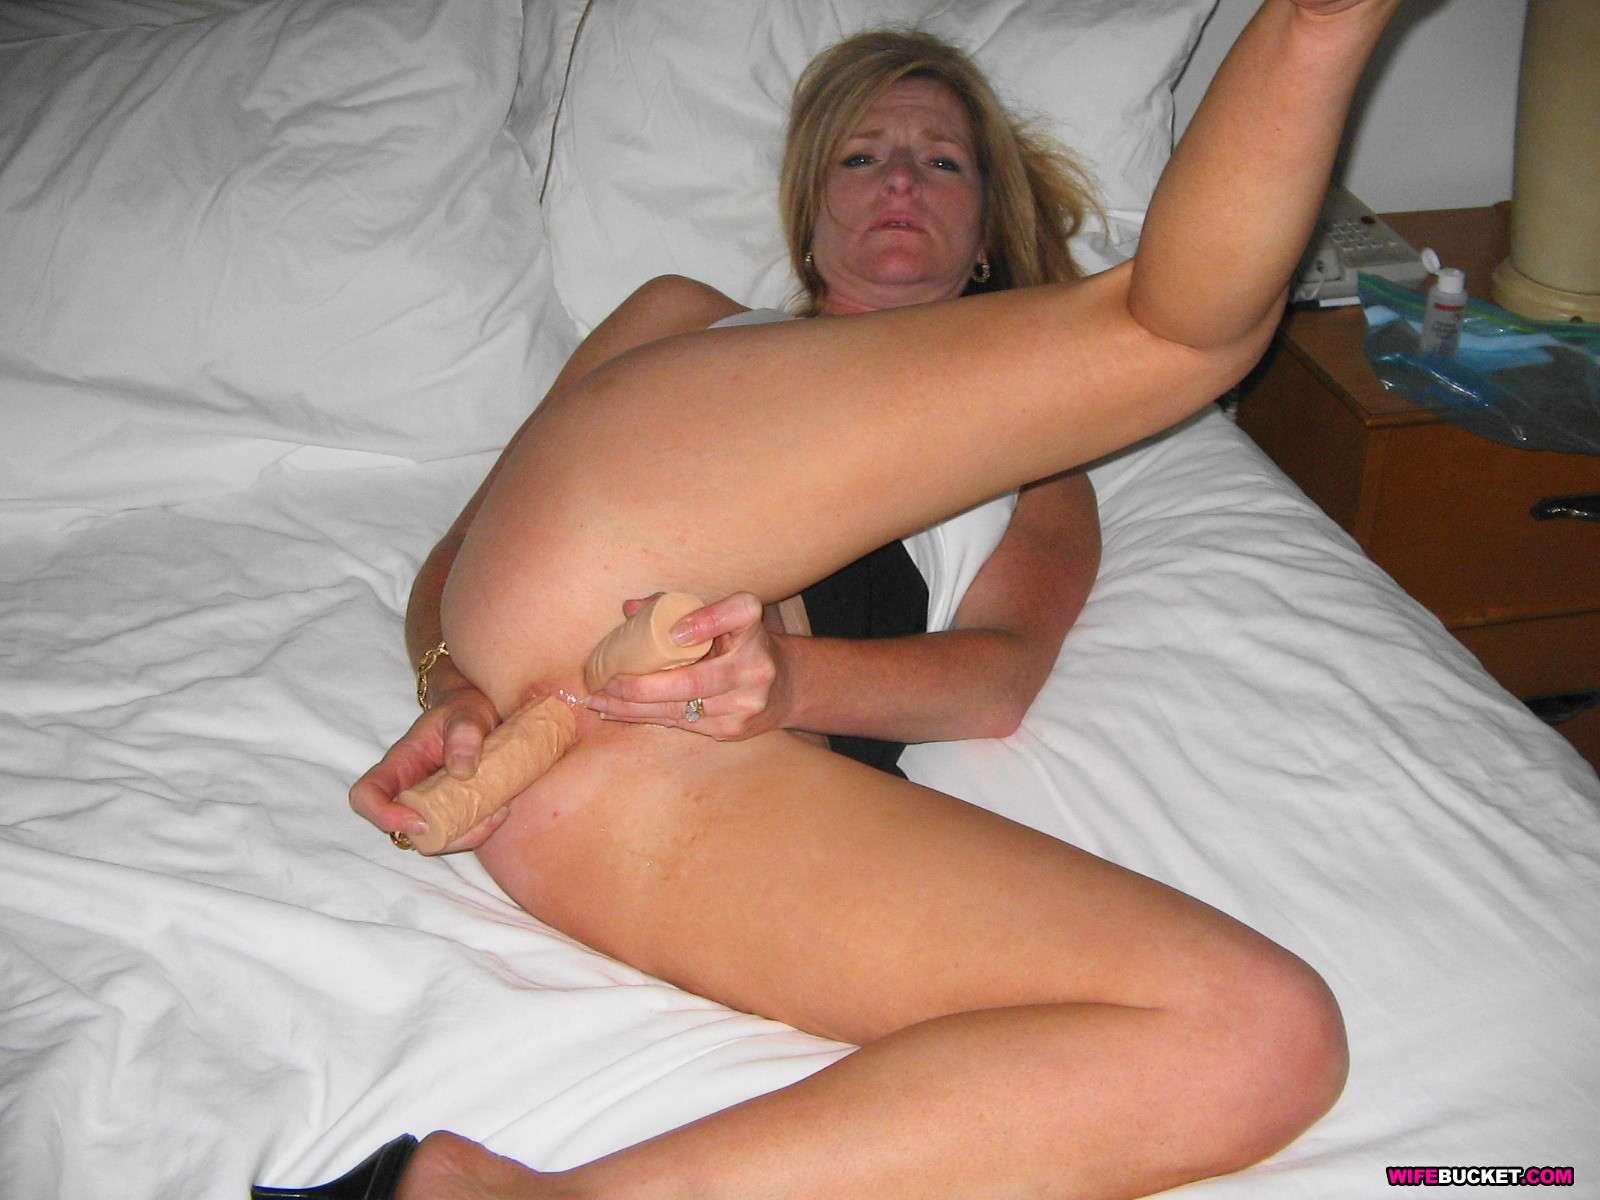 Фото секс со стариком 60лет 4 фотография